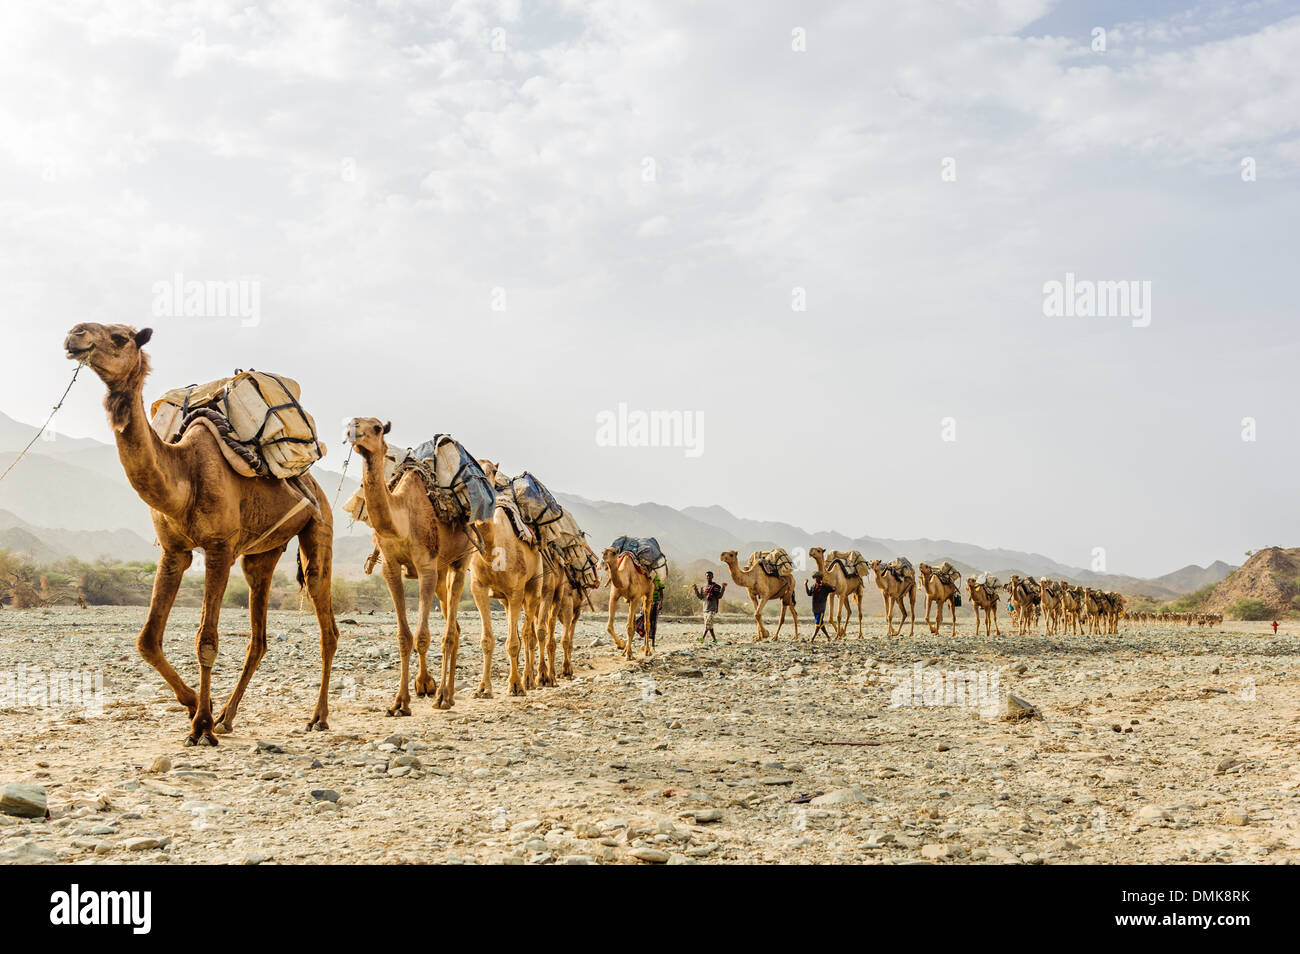 Innovative Camel Caravan In The Eastern Sinai Peninsula Photo By Ferrell Jenkins